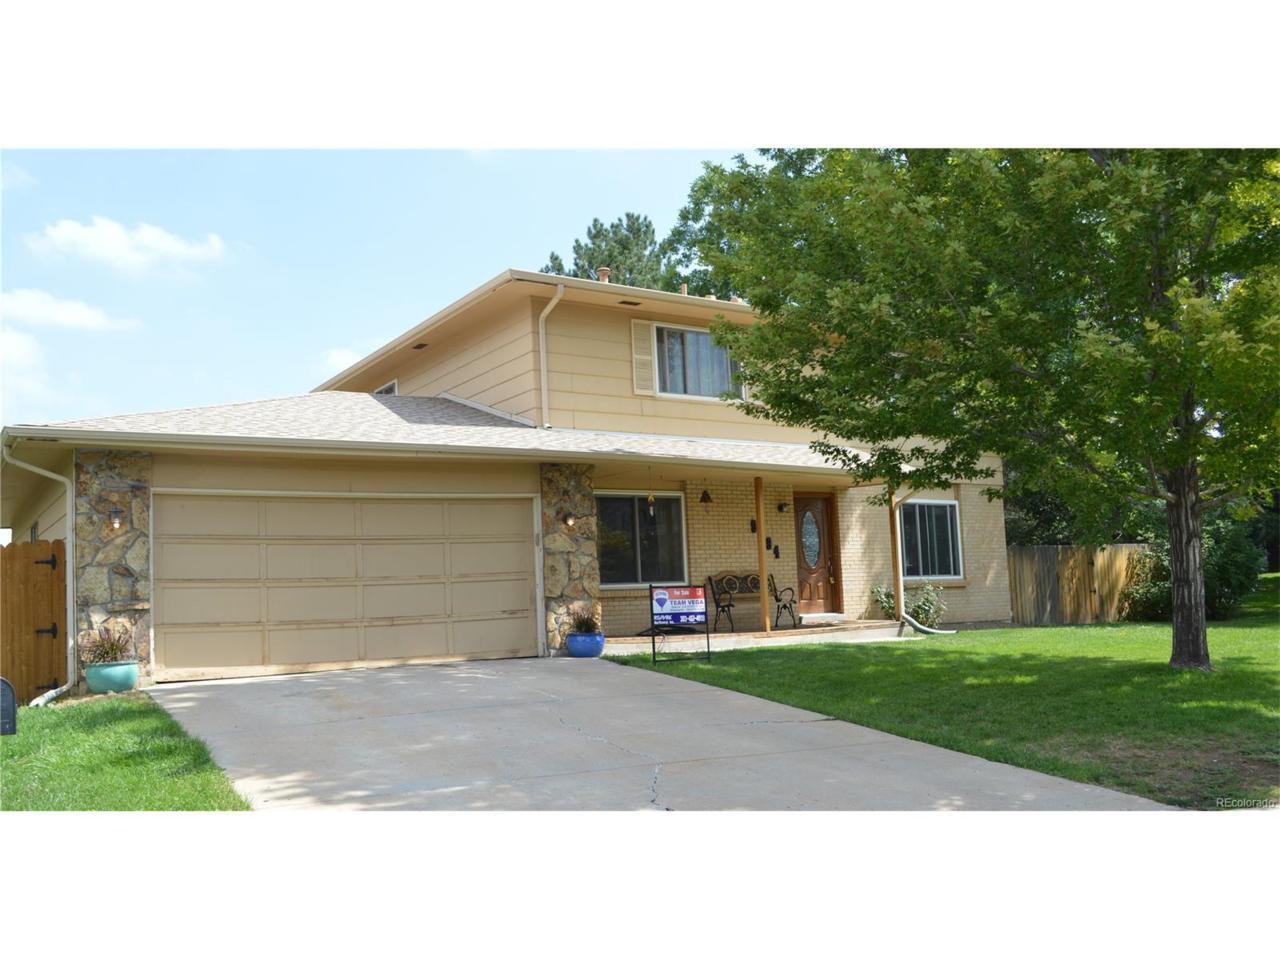 9694 Newton Street, Westminster, CO 80031 (MLS #4352134) :: 8z Real Estate